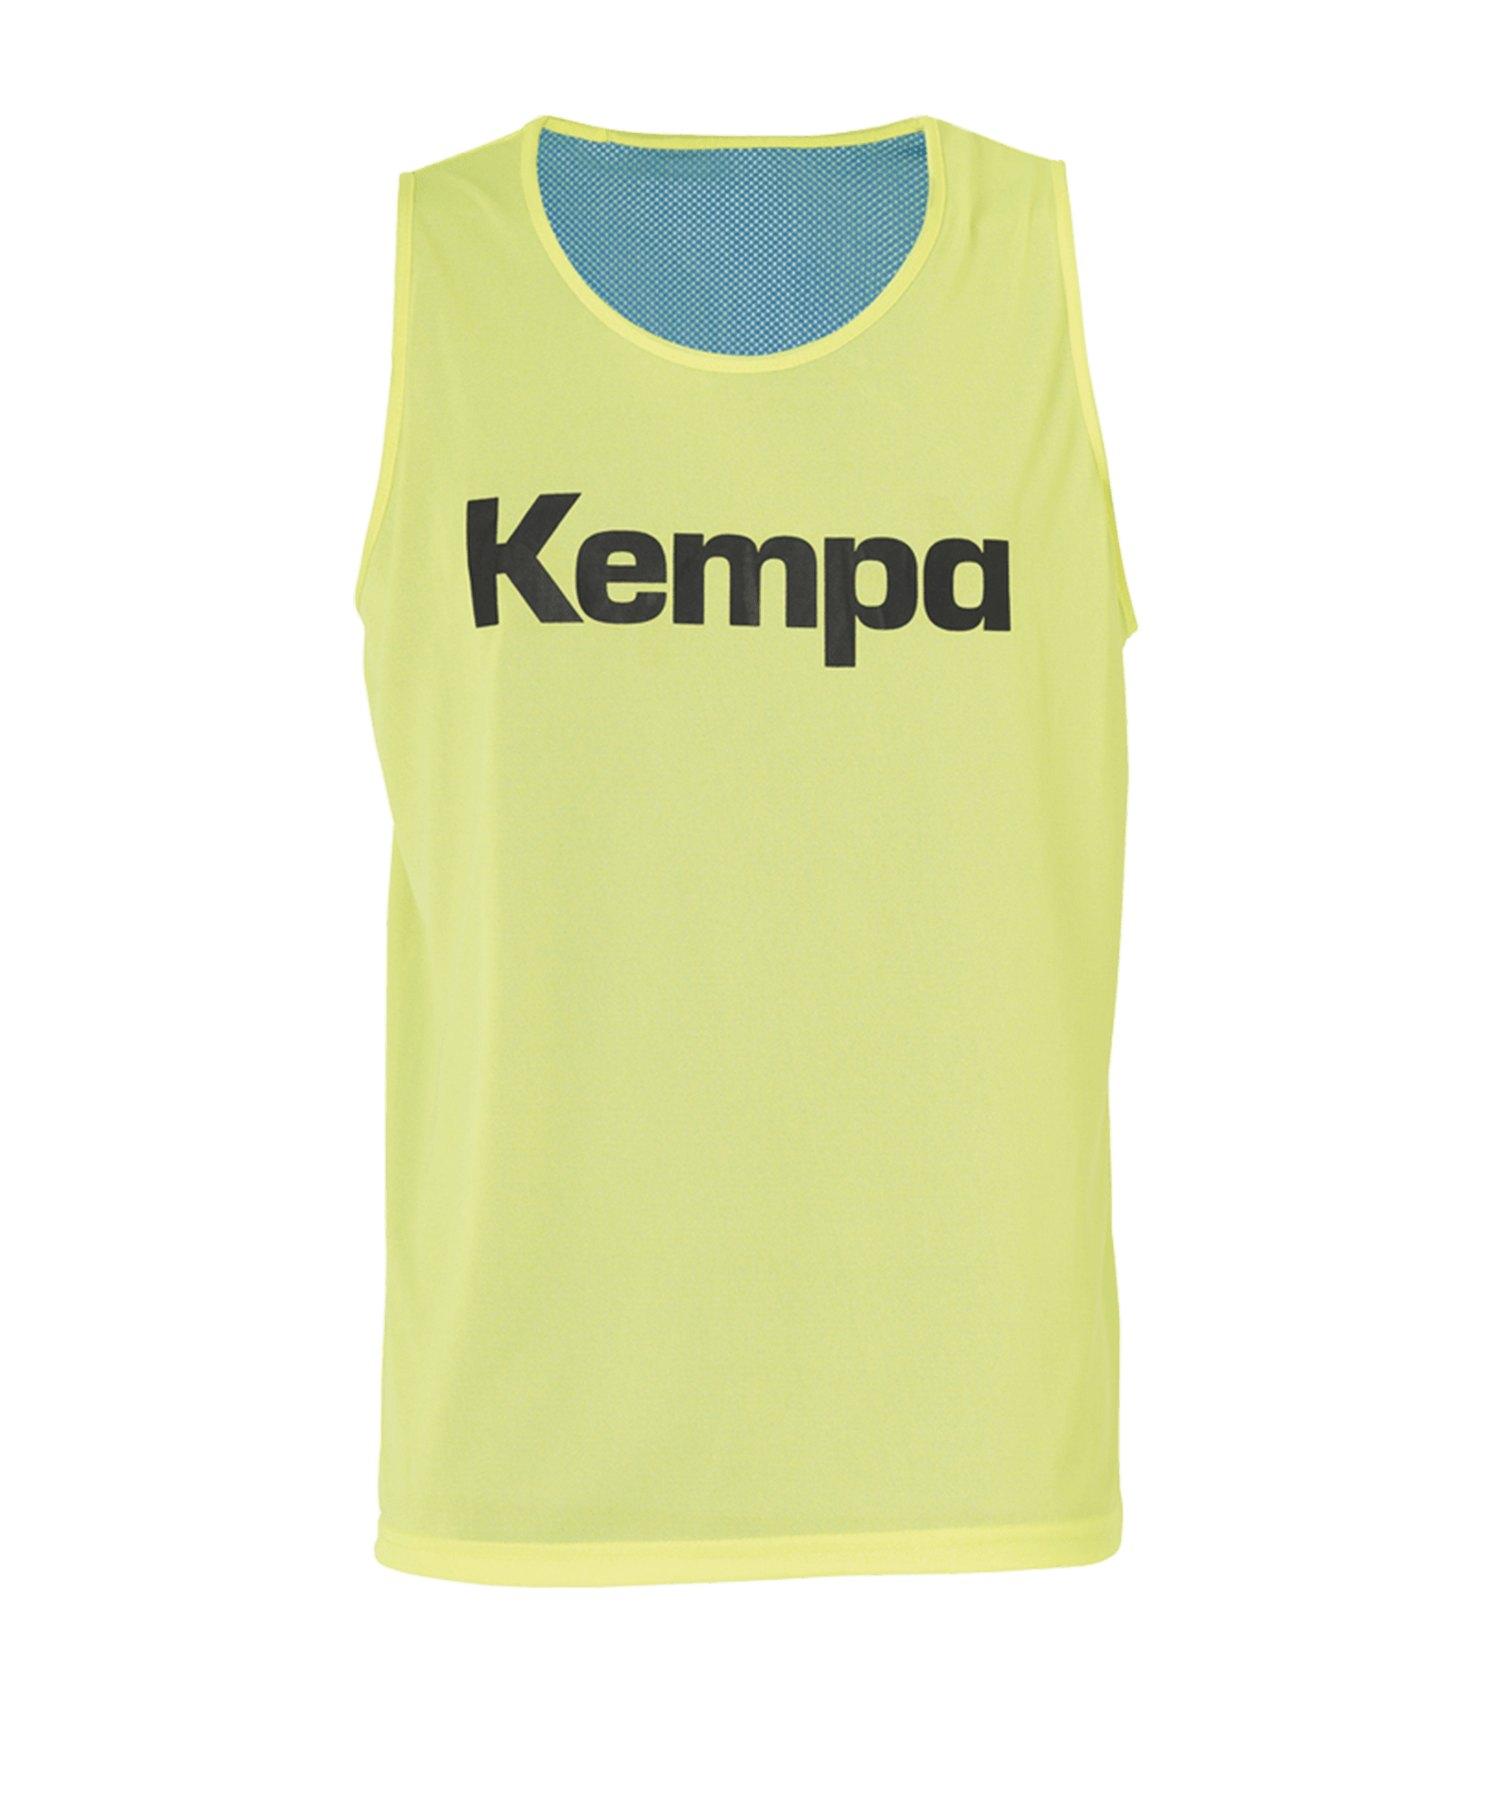 Kempa Wende Markierungshemd Gelb Blau F02 - gelb